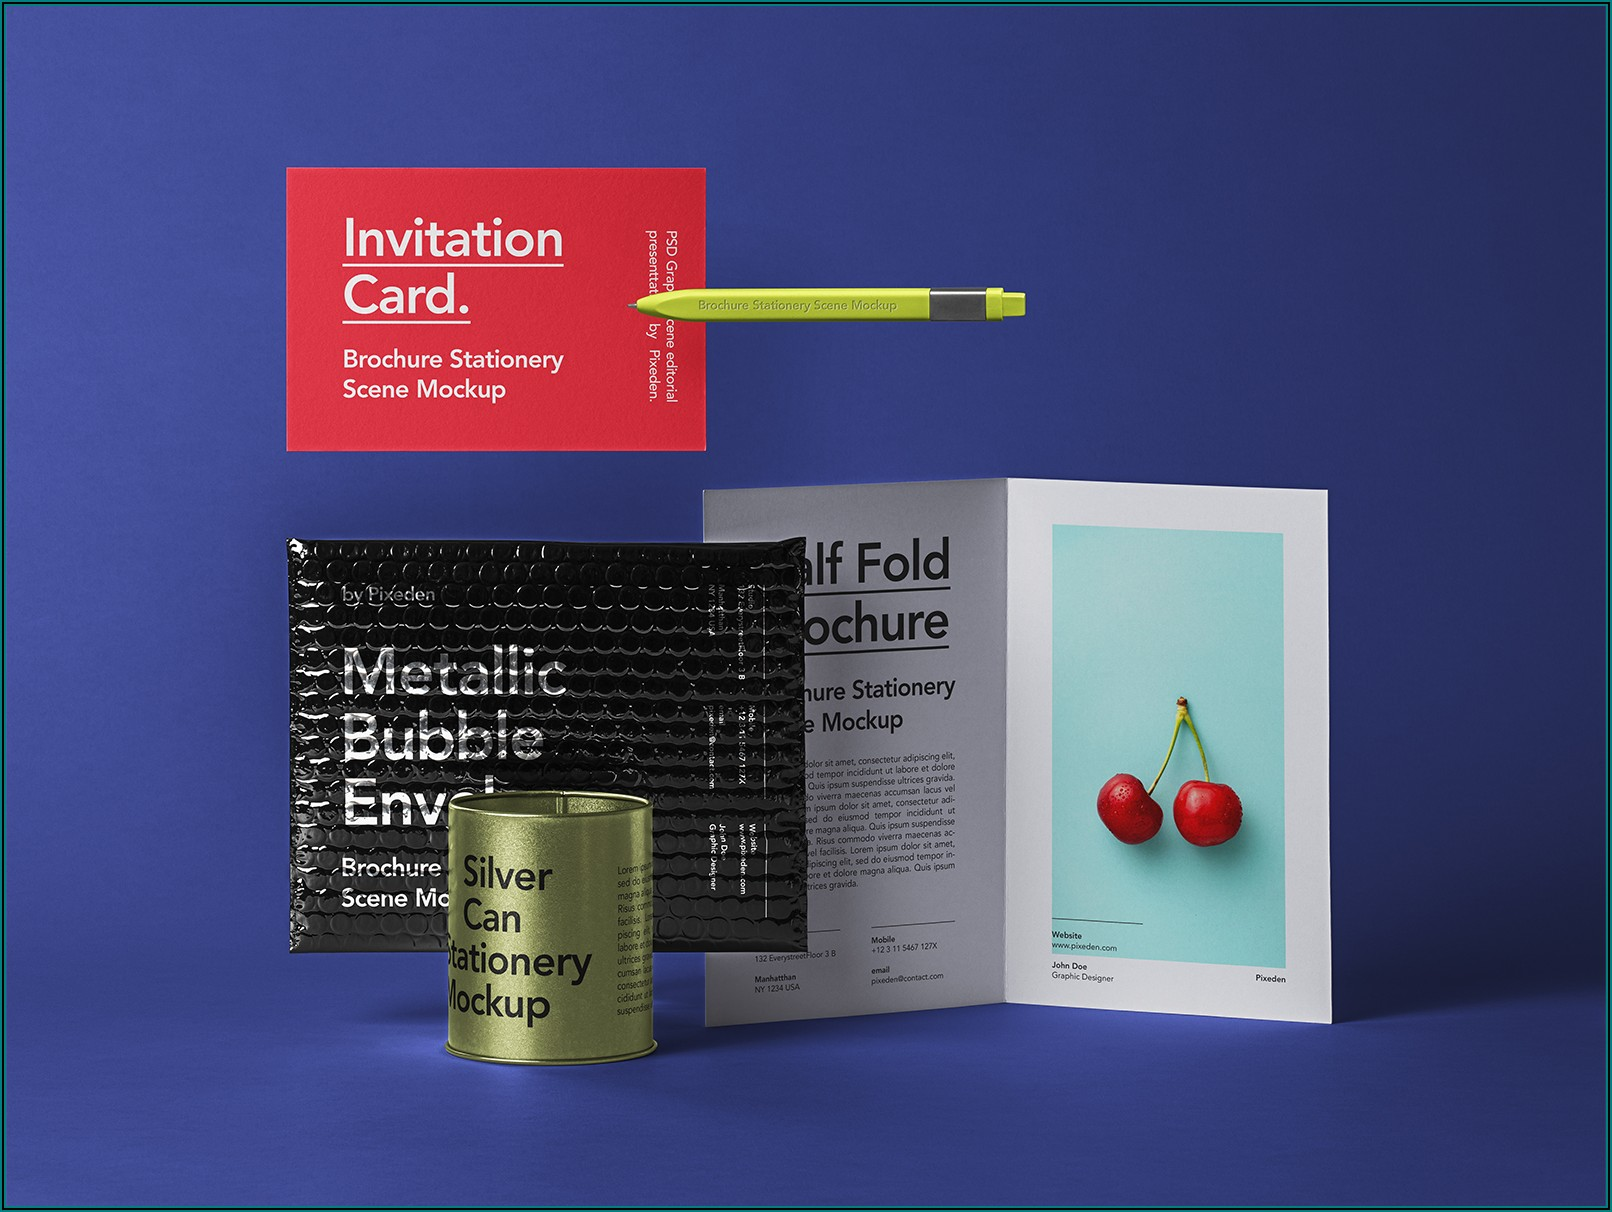 Half Fold Brochure Mockup Free